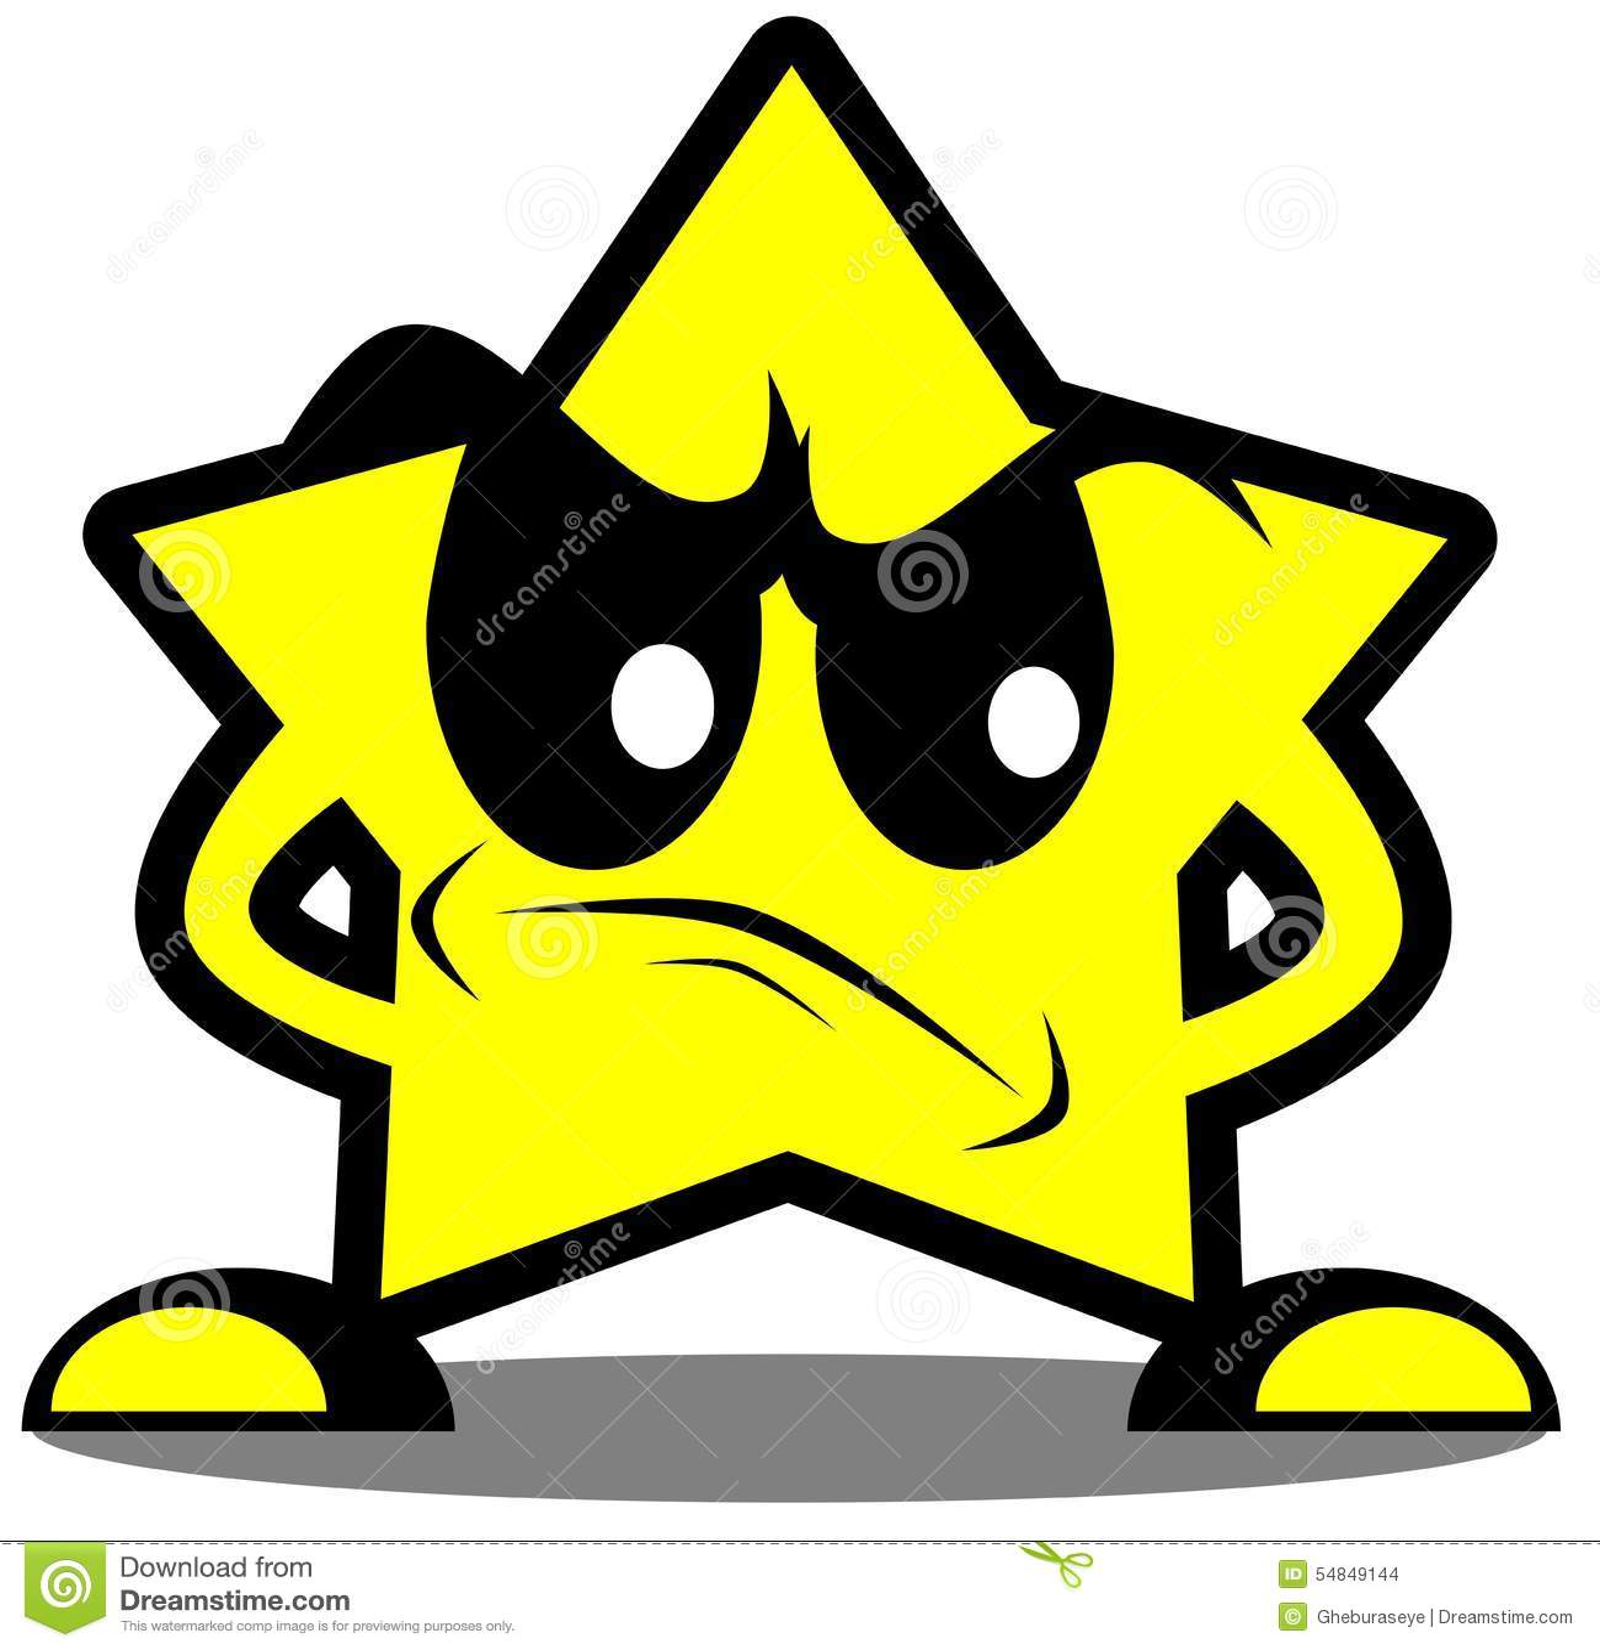 Historieta enojada de la estrella aislada